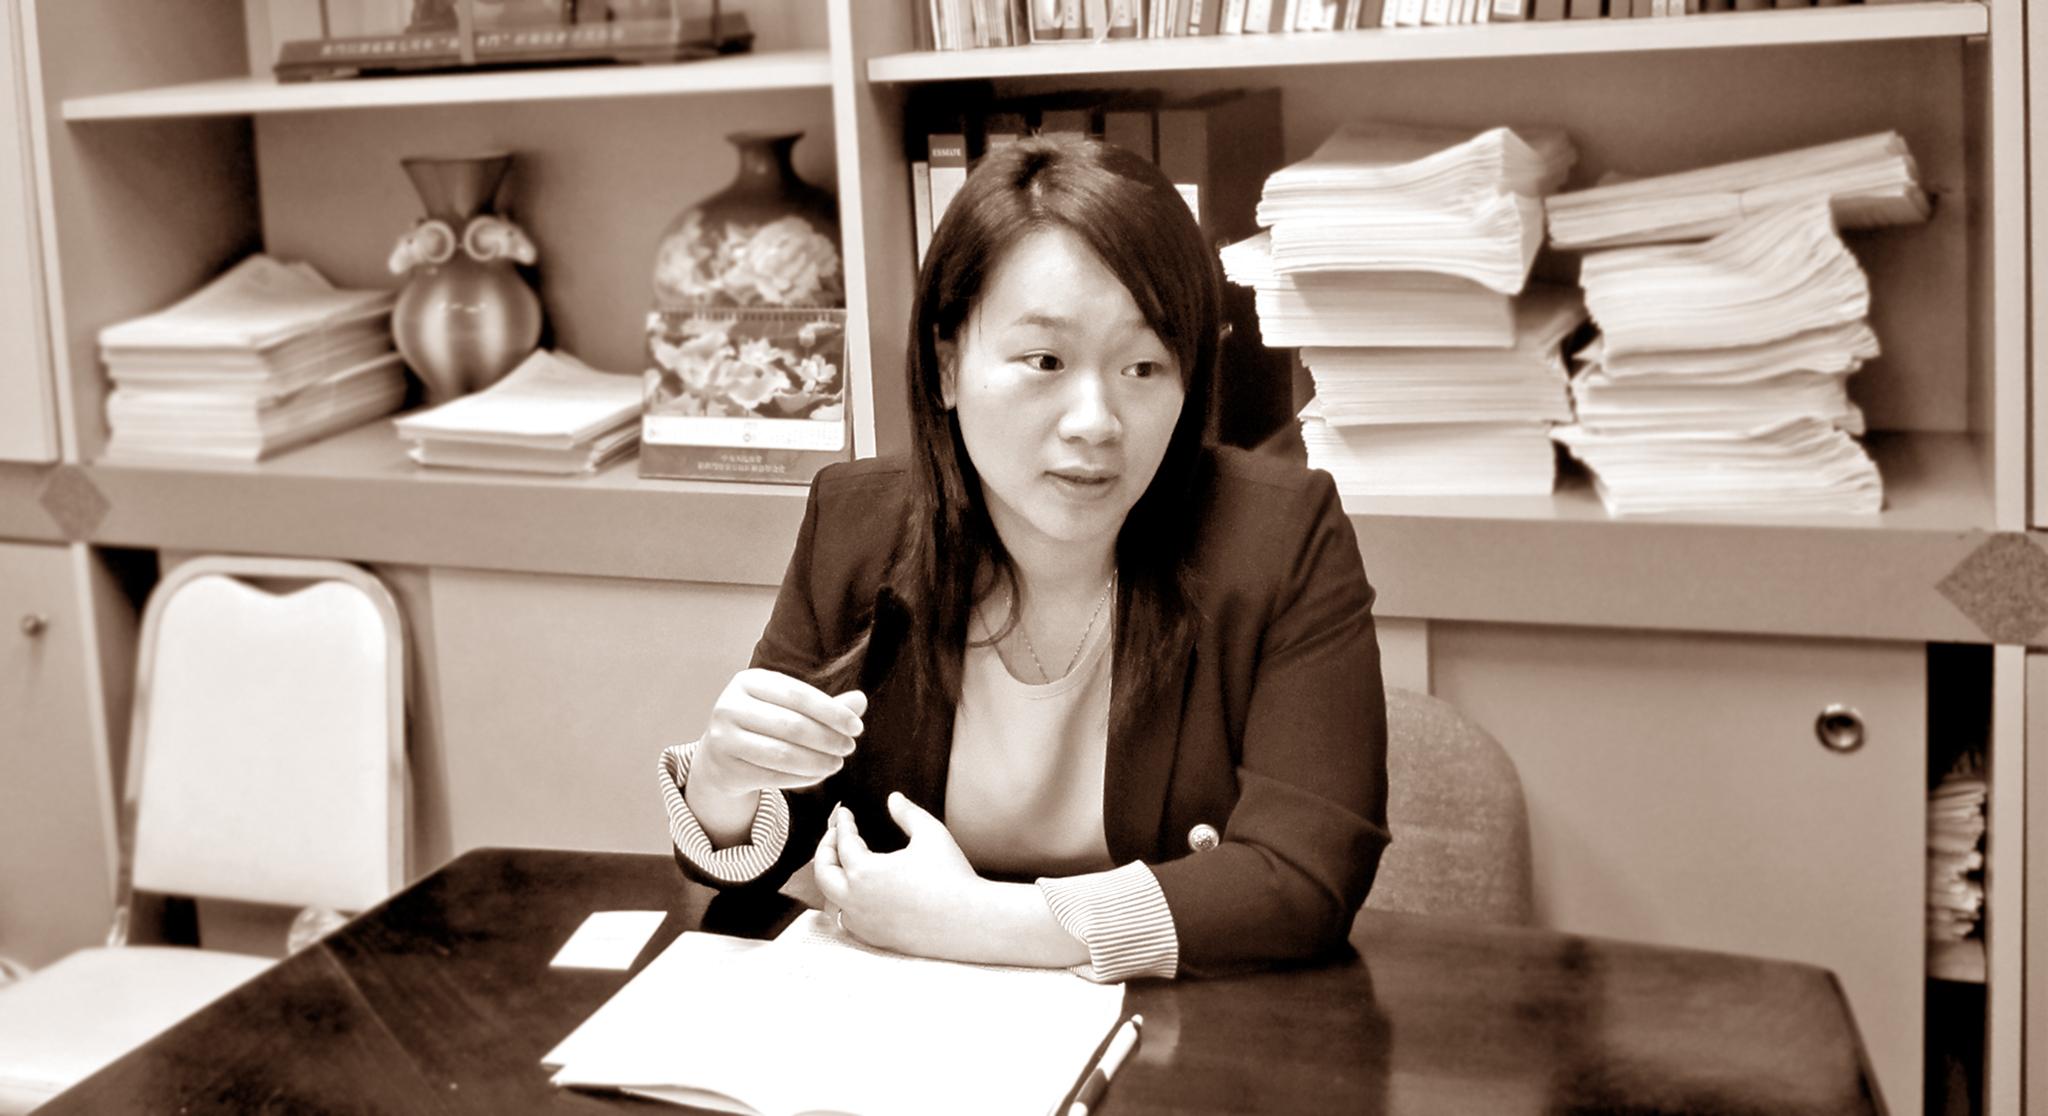 Wong Kit Cheng declara guerra a folhetos pornográficos